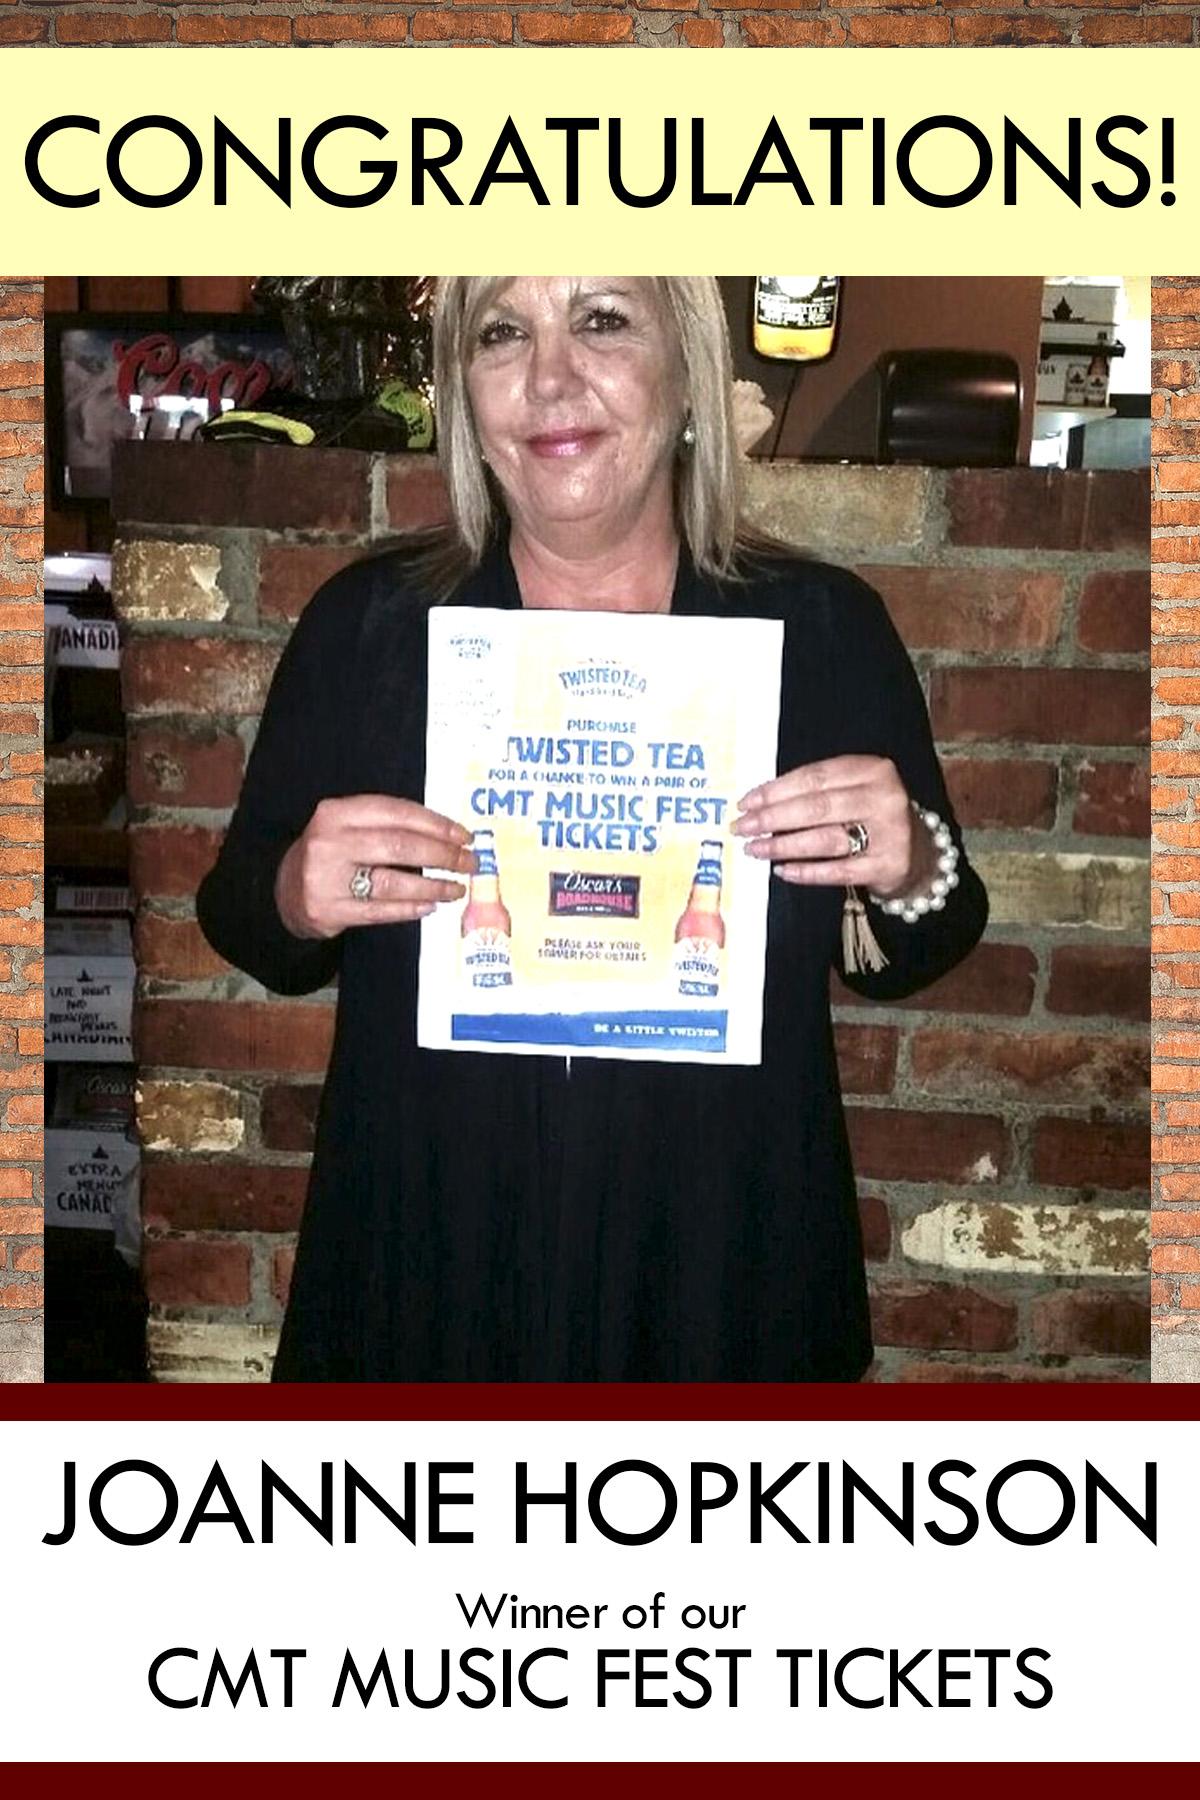 Congratulations Joanne Hopkinsons